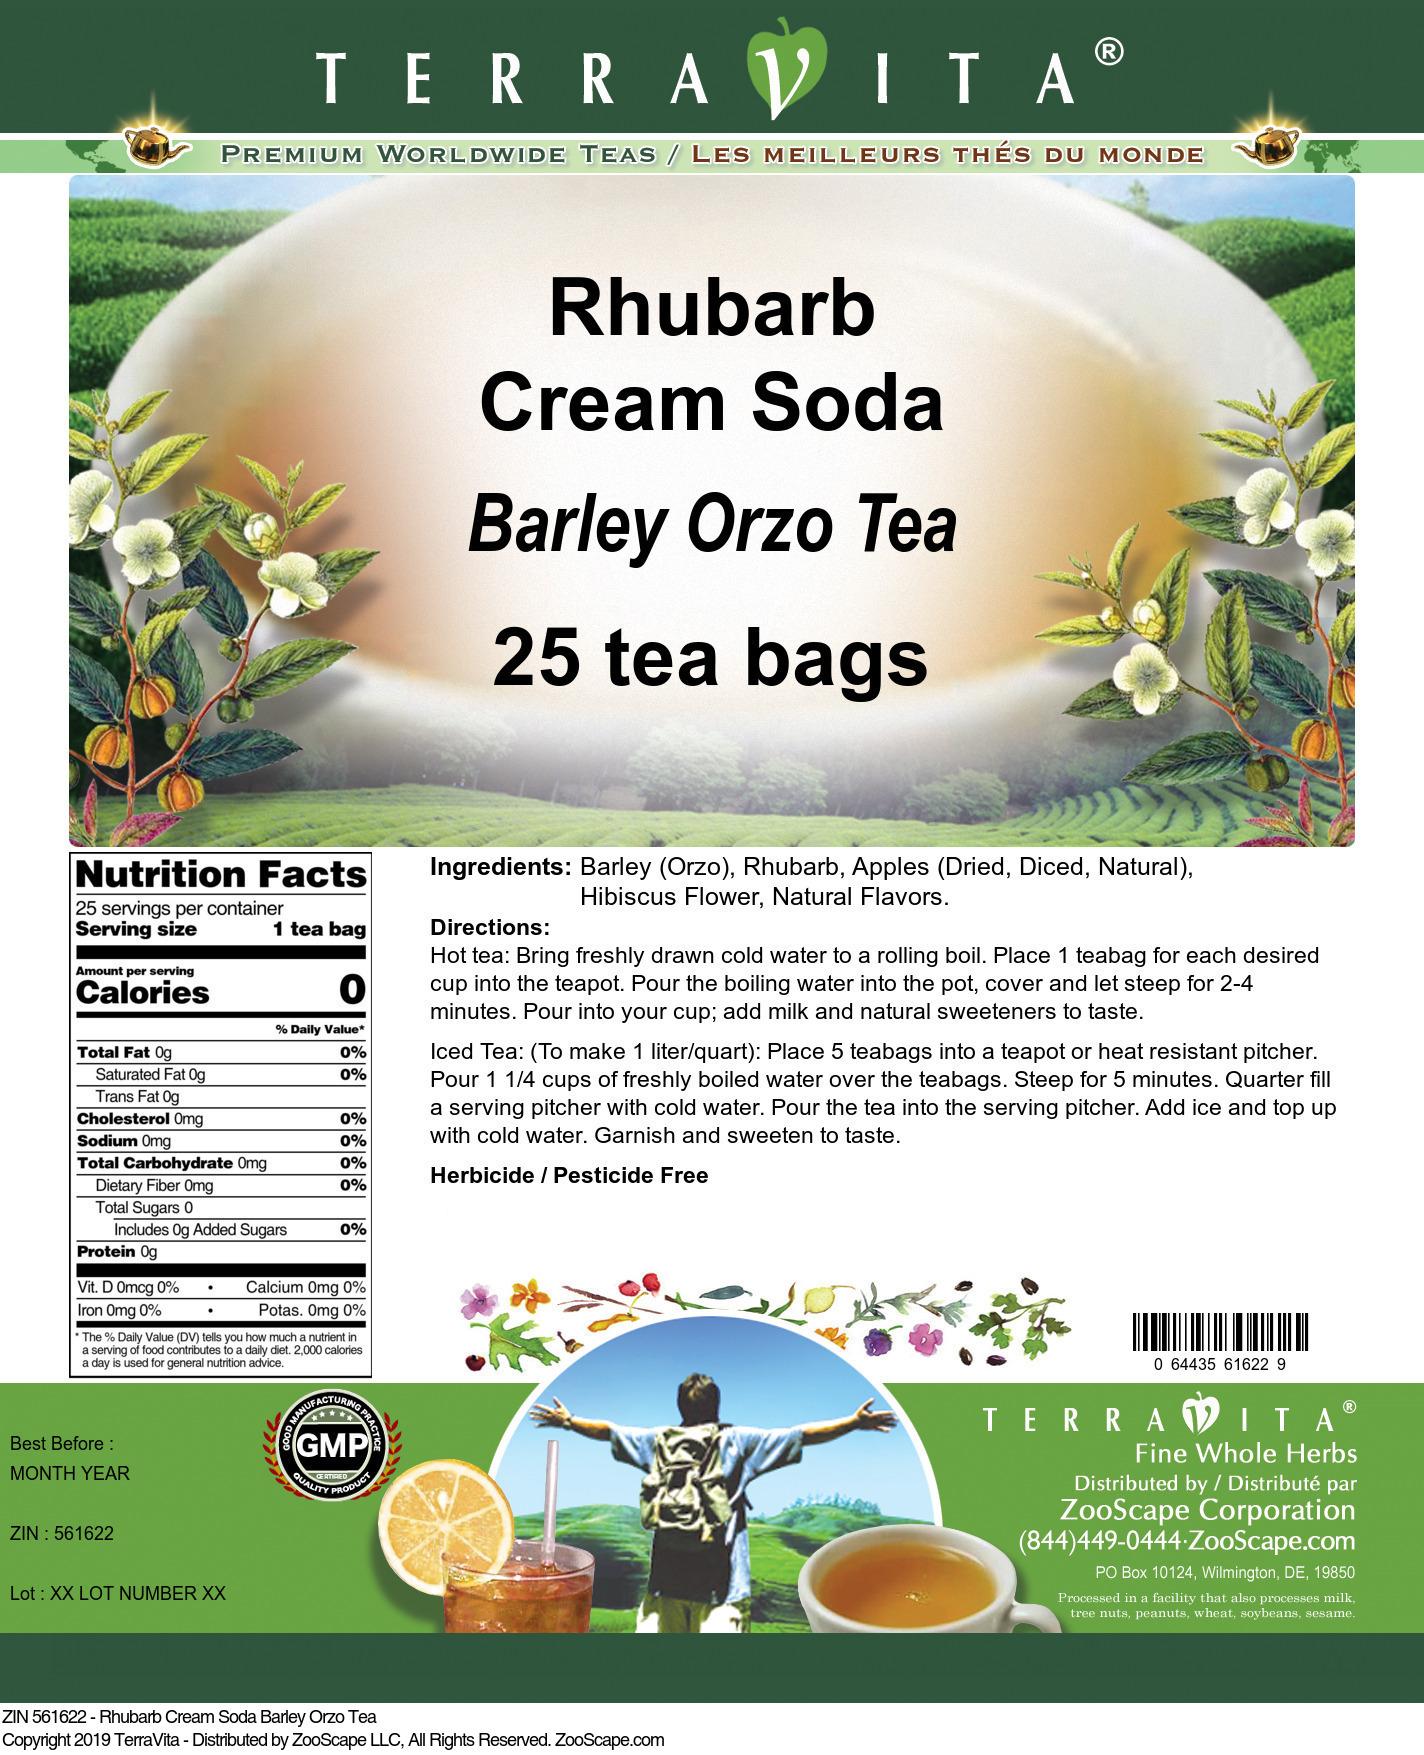 Rhubarb Cream Soda Barley Orzo